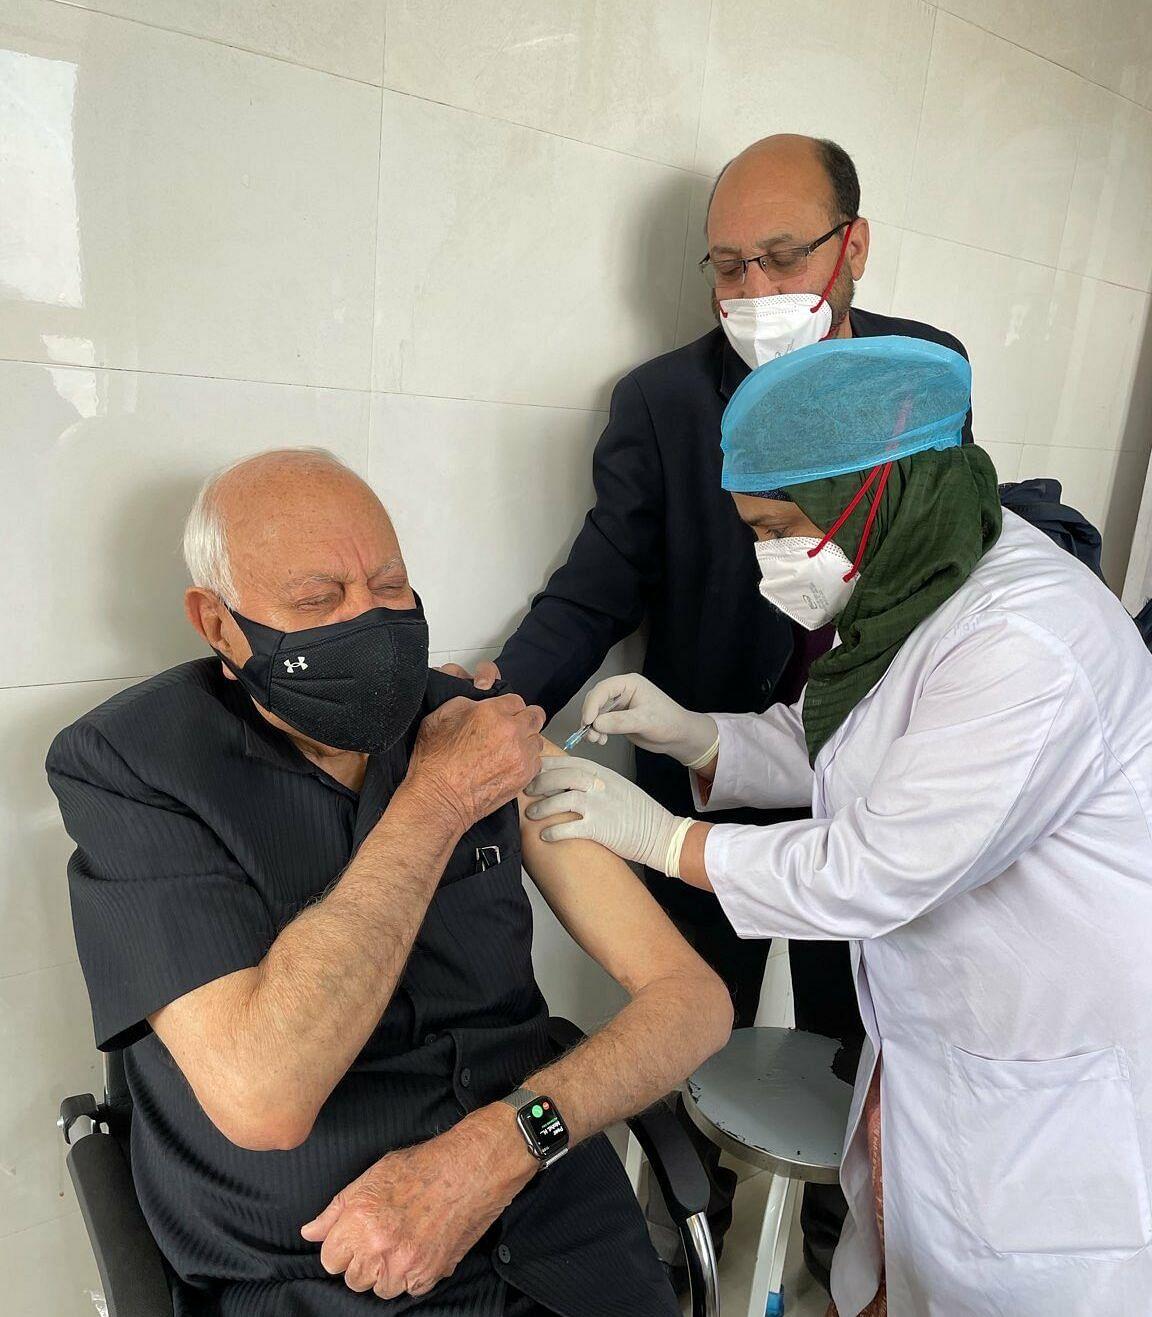 Farooq Abdullah, wife receive COVID-19 vaccine shots